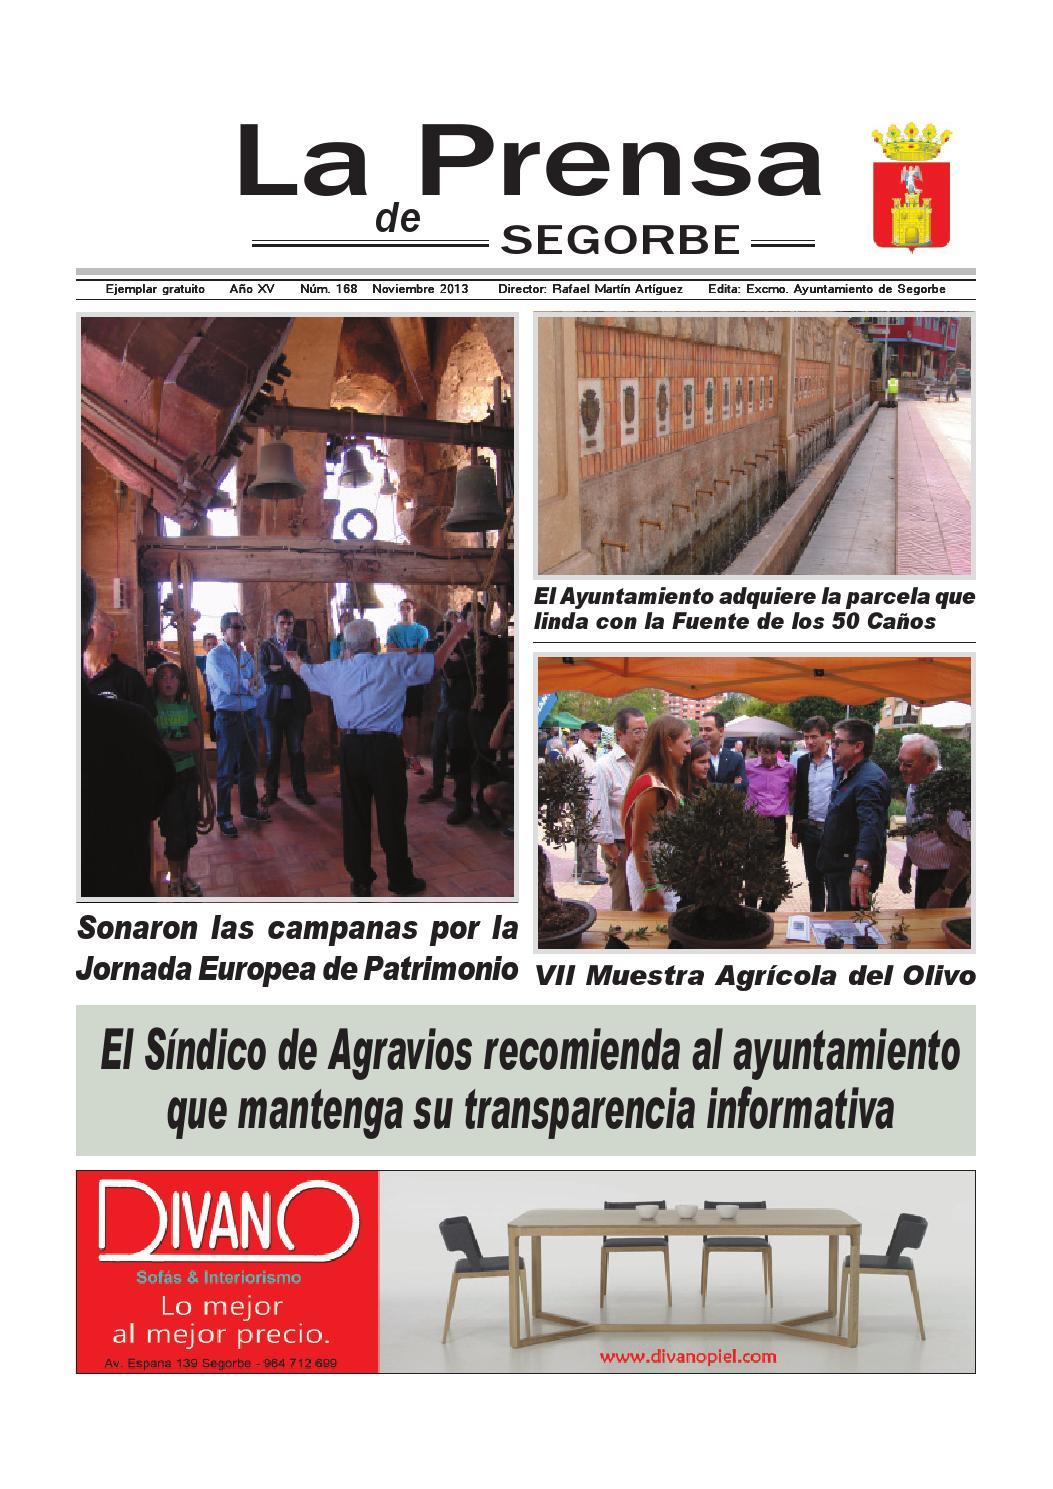 La Prensa De Segorbe N 168 Noviembre 2013 By Rafael Calvo Calpe  # Muebles Tina Calamocha